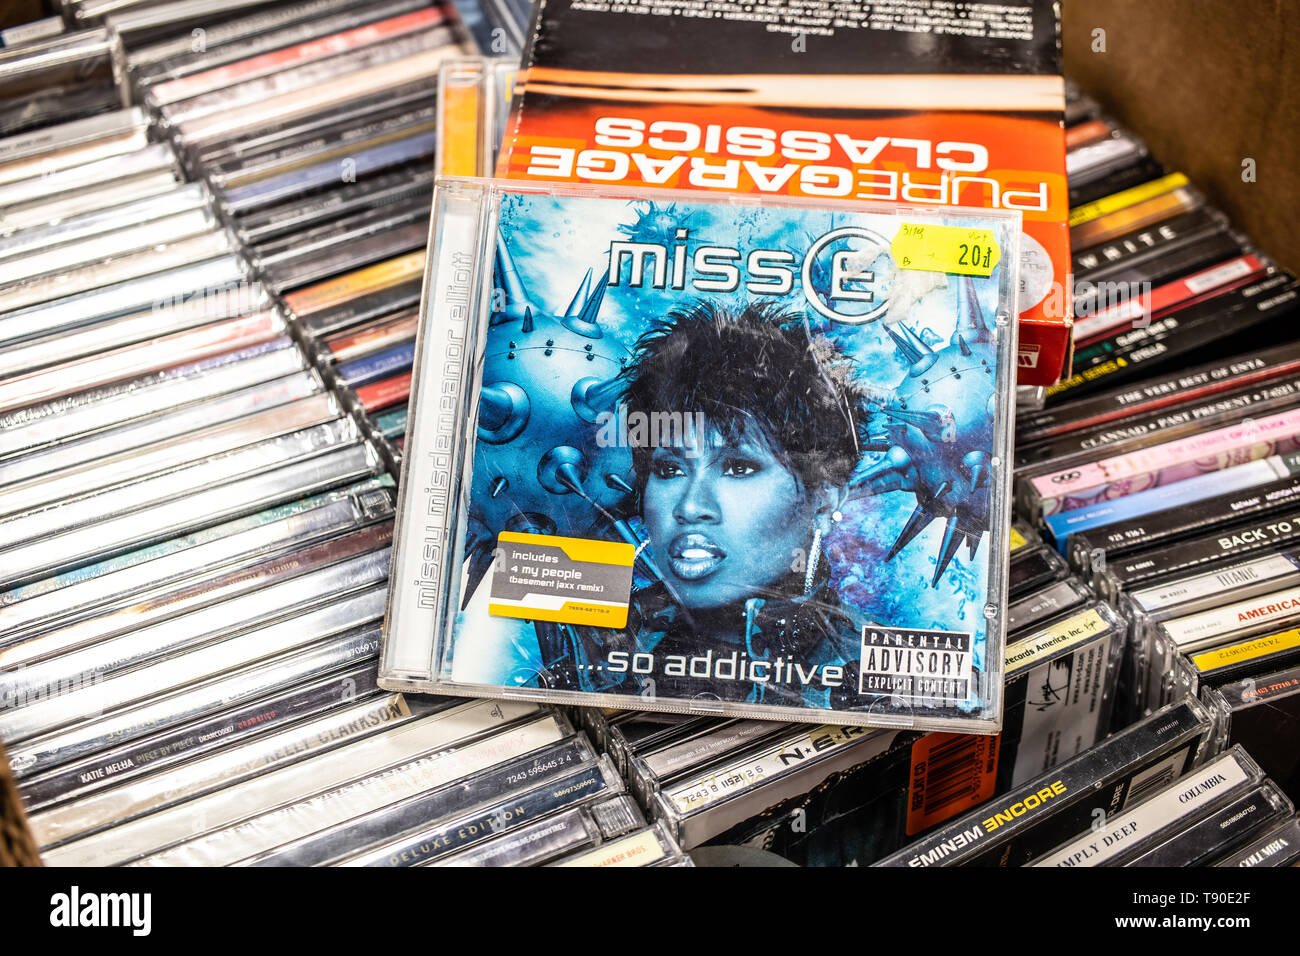 Nadarzyn, Poland, May 11, 2019: Missy Misdemeanor Elliott CD album MissE So Addictive 2001 on display for sale, famous American rapper, singer - Stock Image